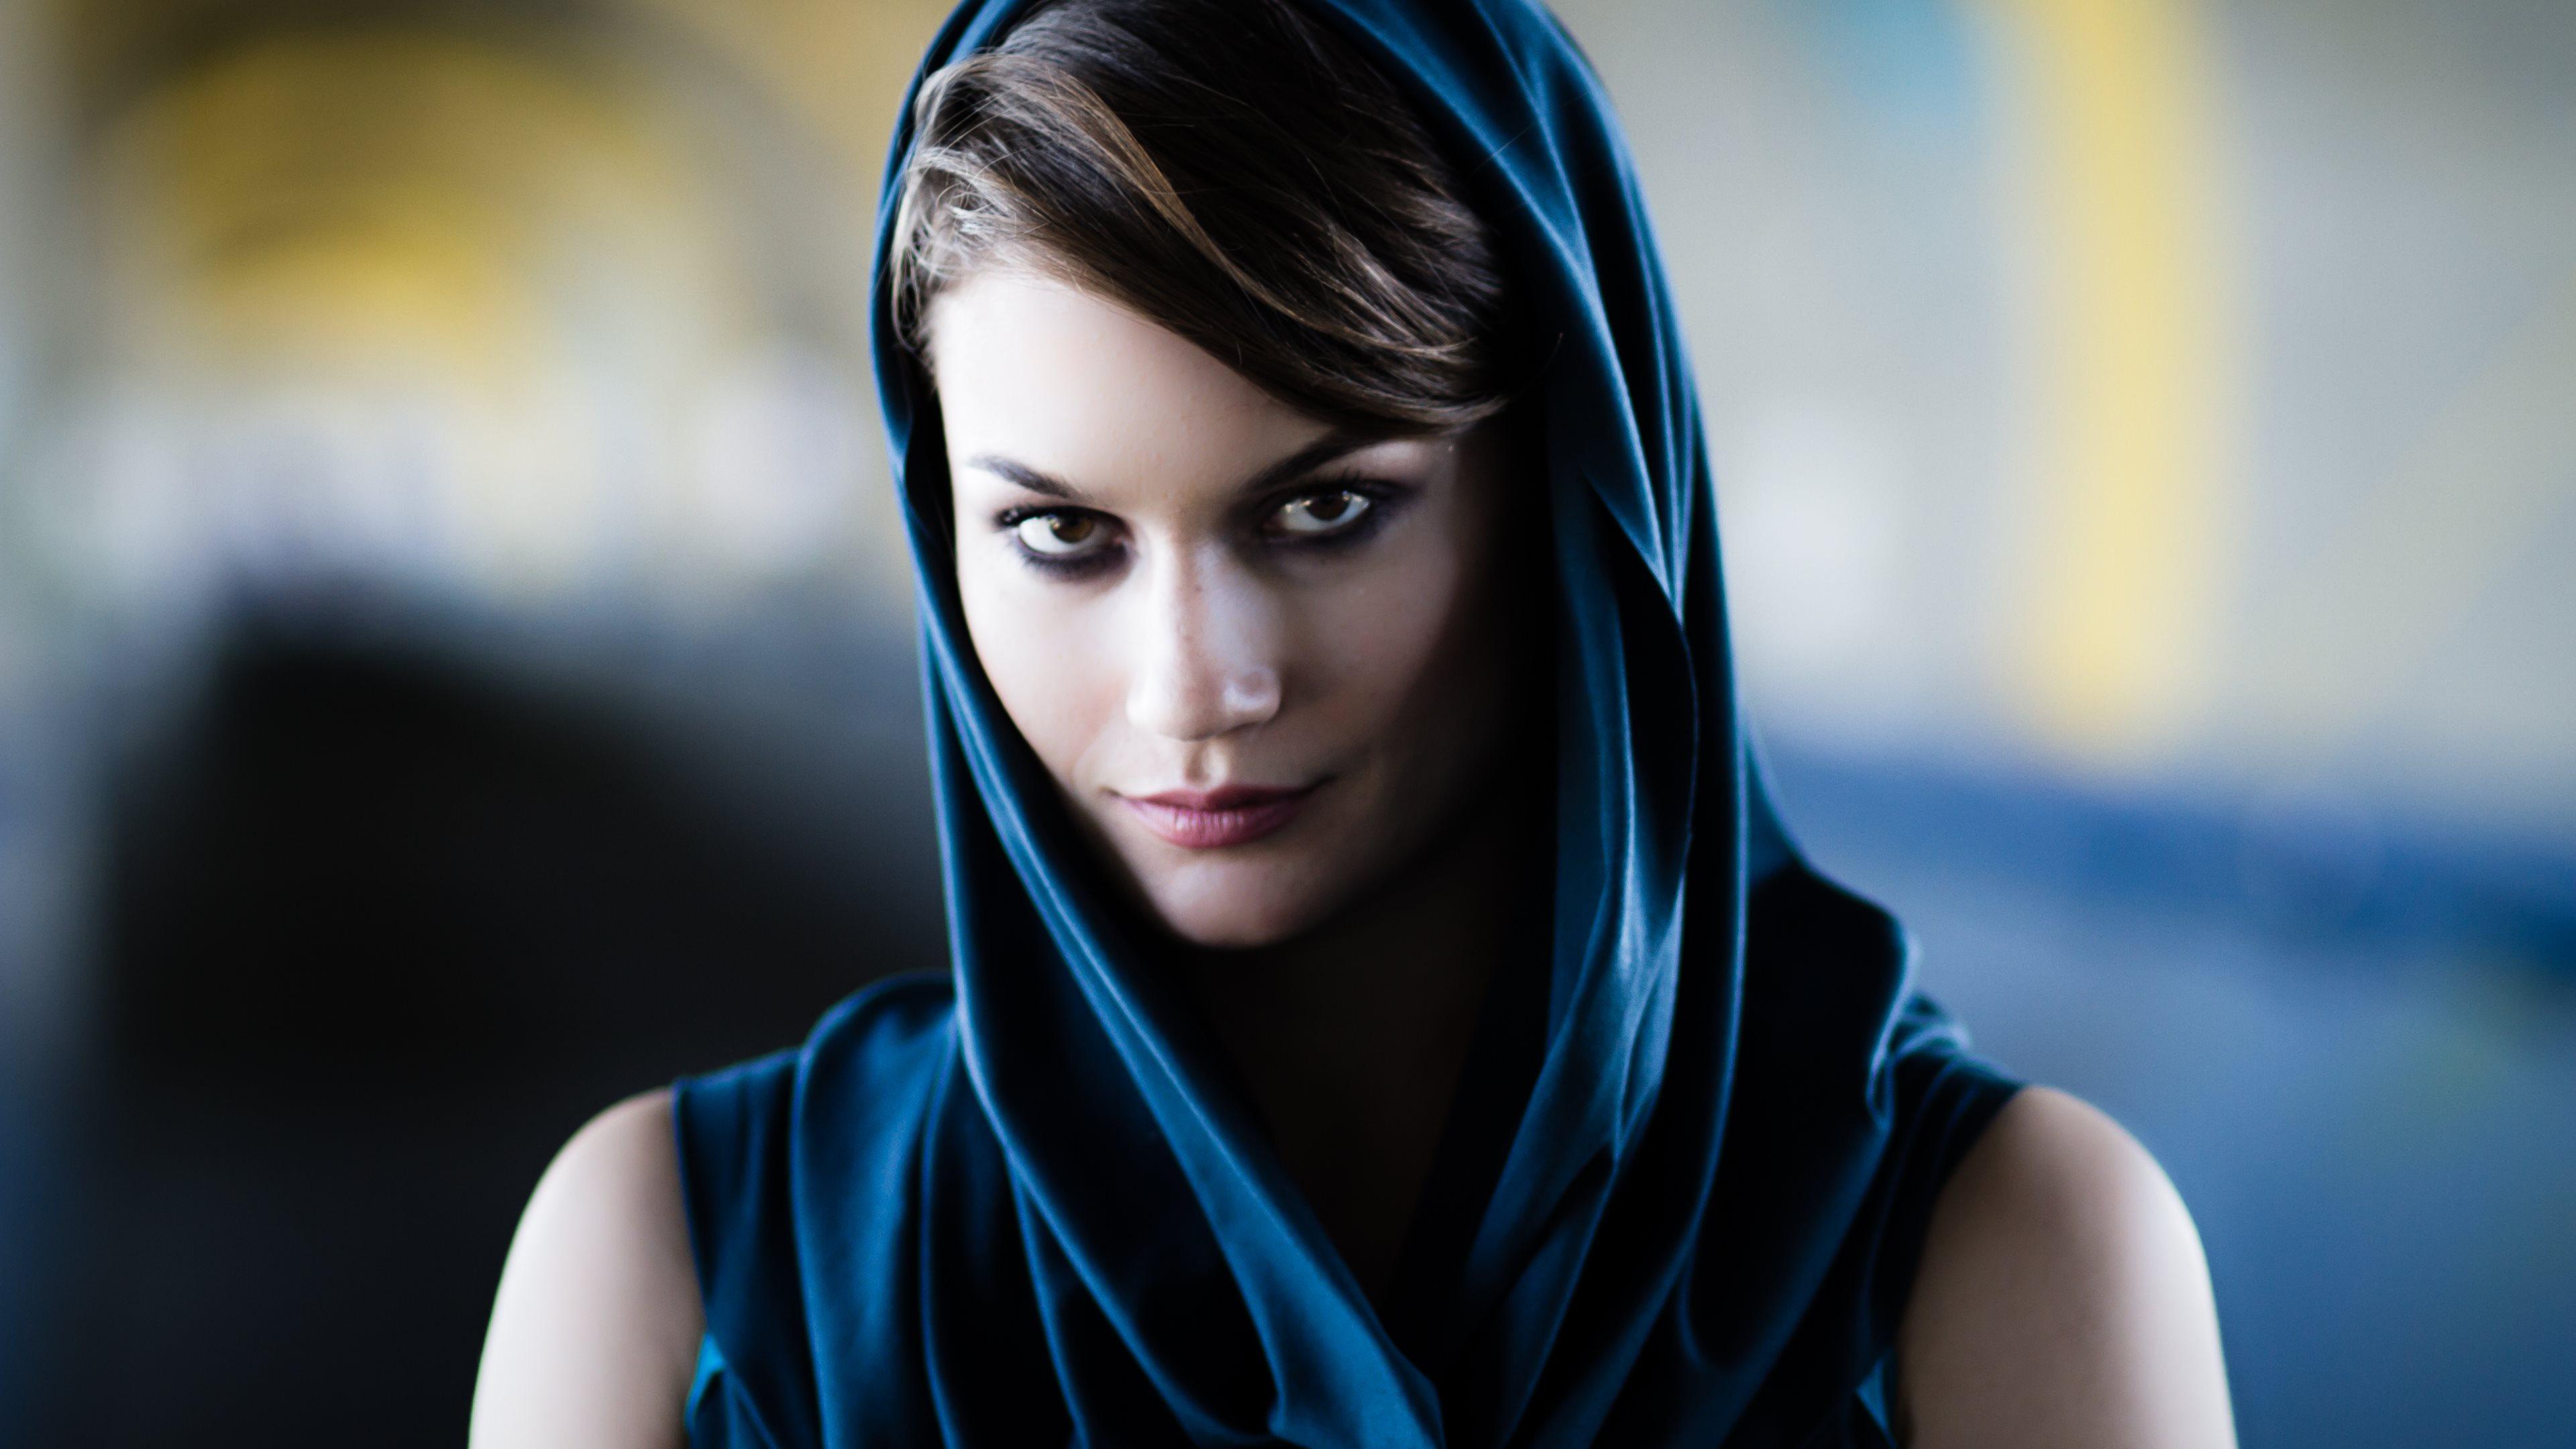 women 4k Ultra HD Wallpaper and Background 3840x2160 3840x2160